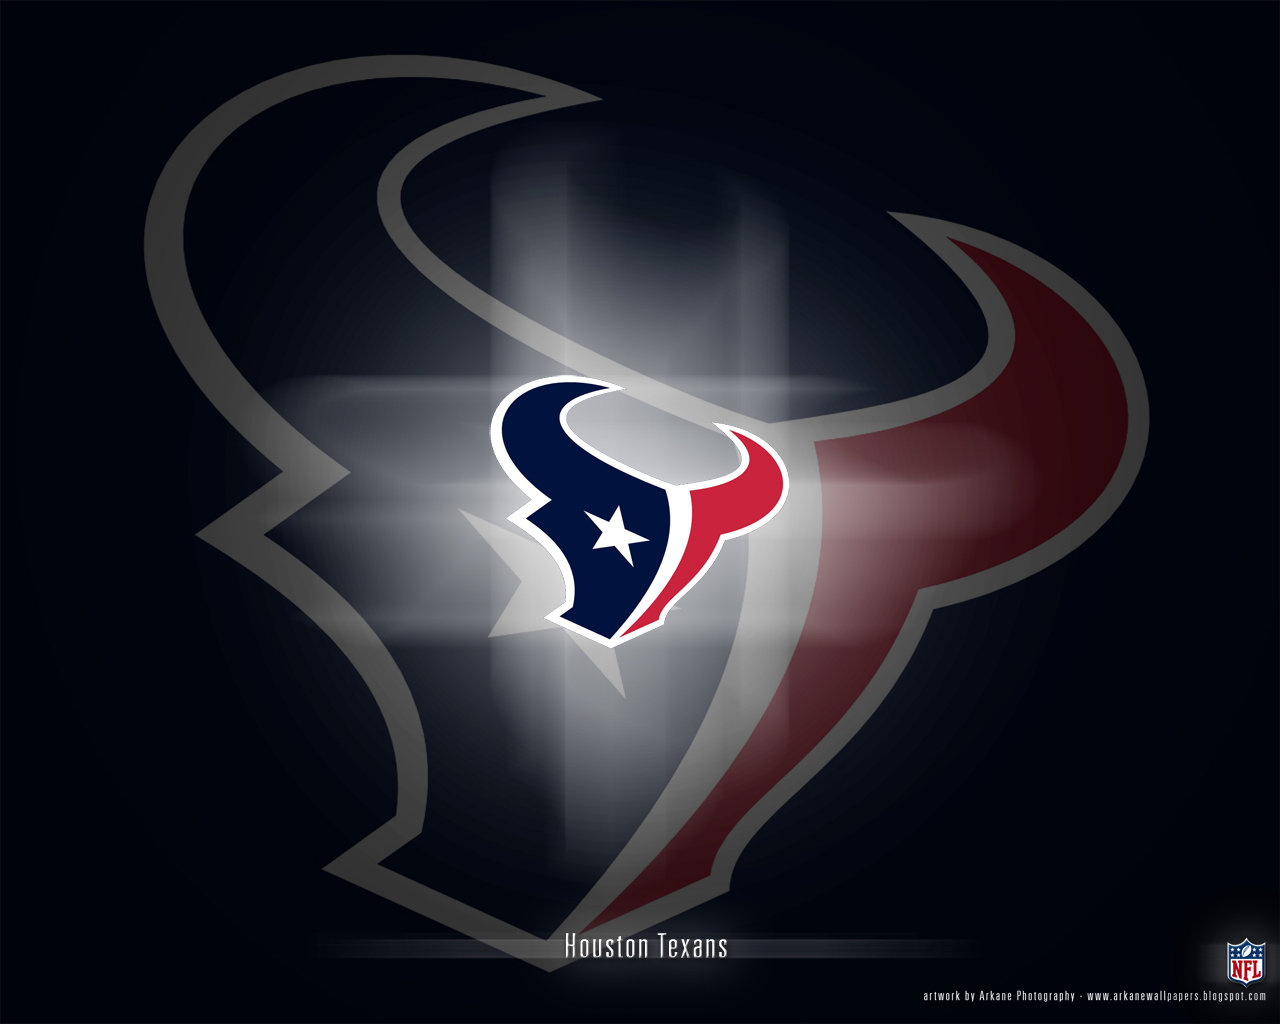 Arkane NFL Wallpapers Houston Texans   Vol 1 1280x1024